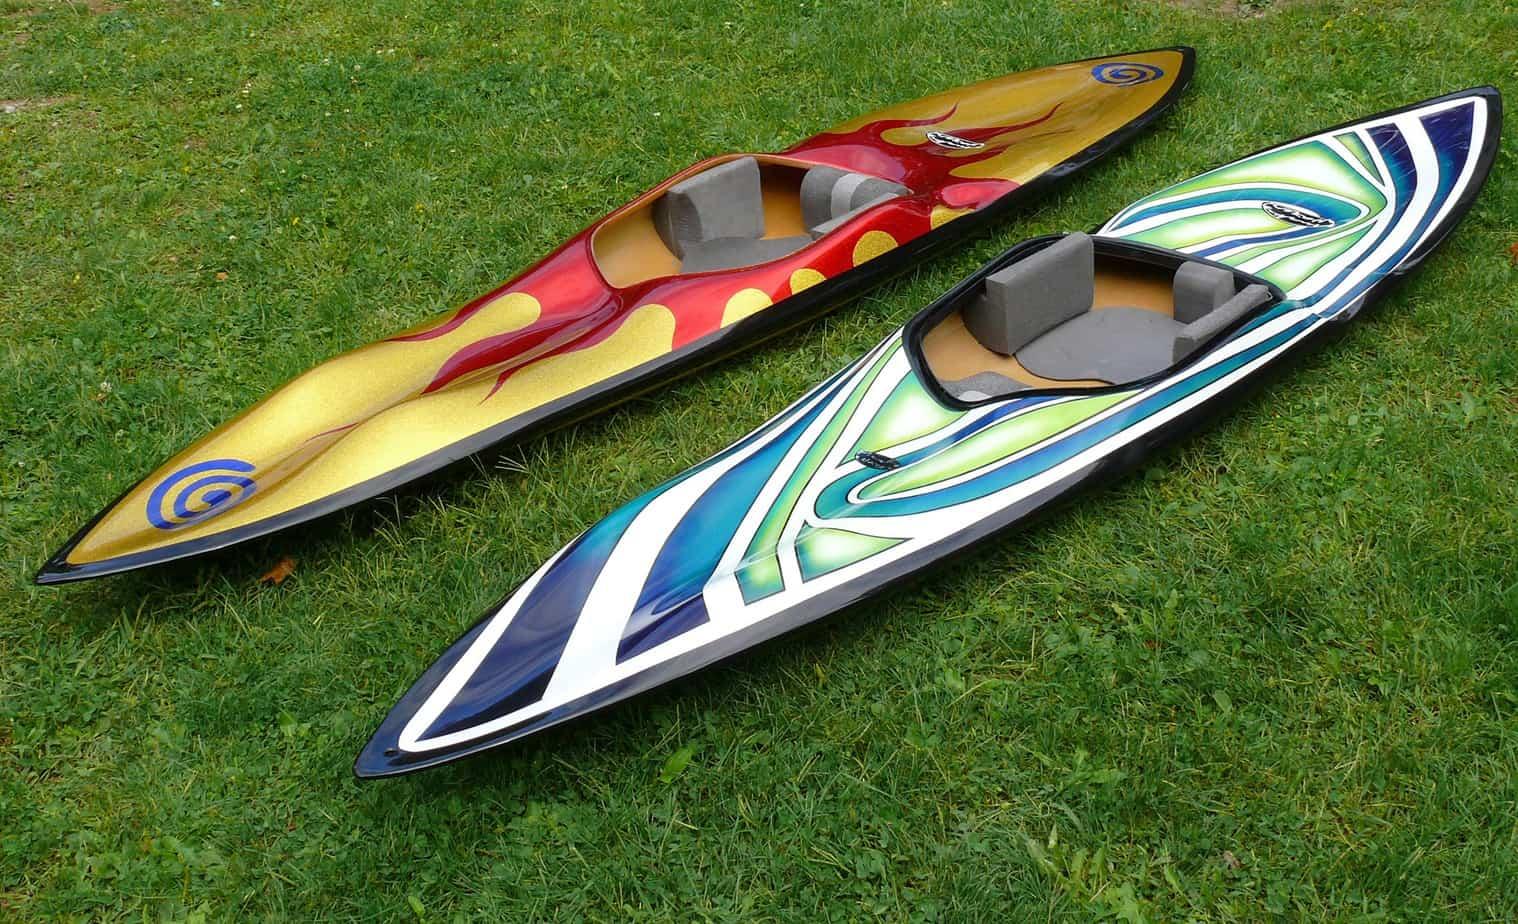 Kayak Painting Ideas & Designs